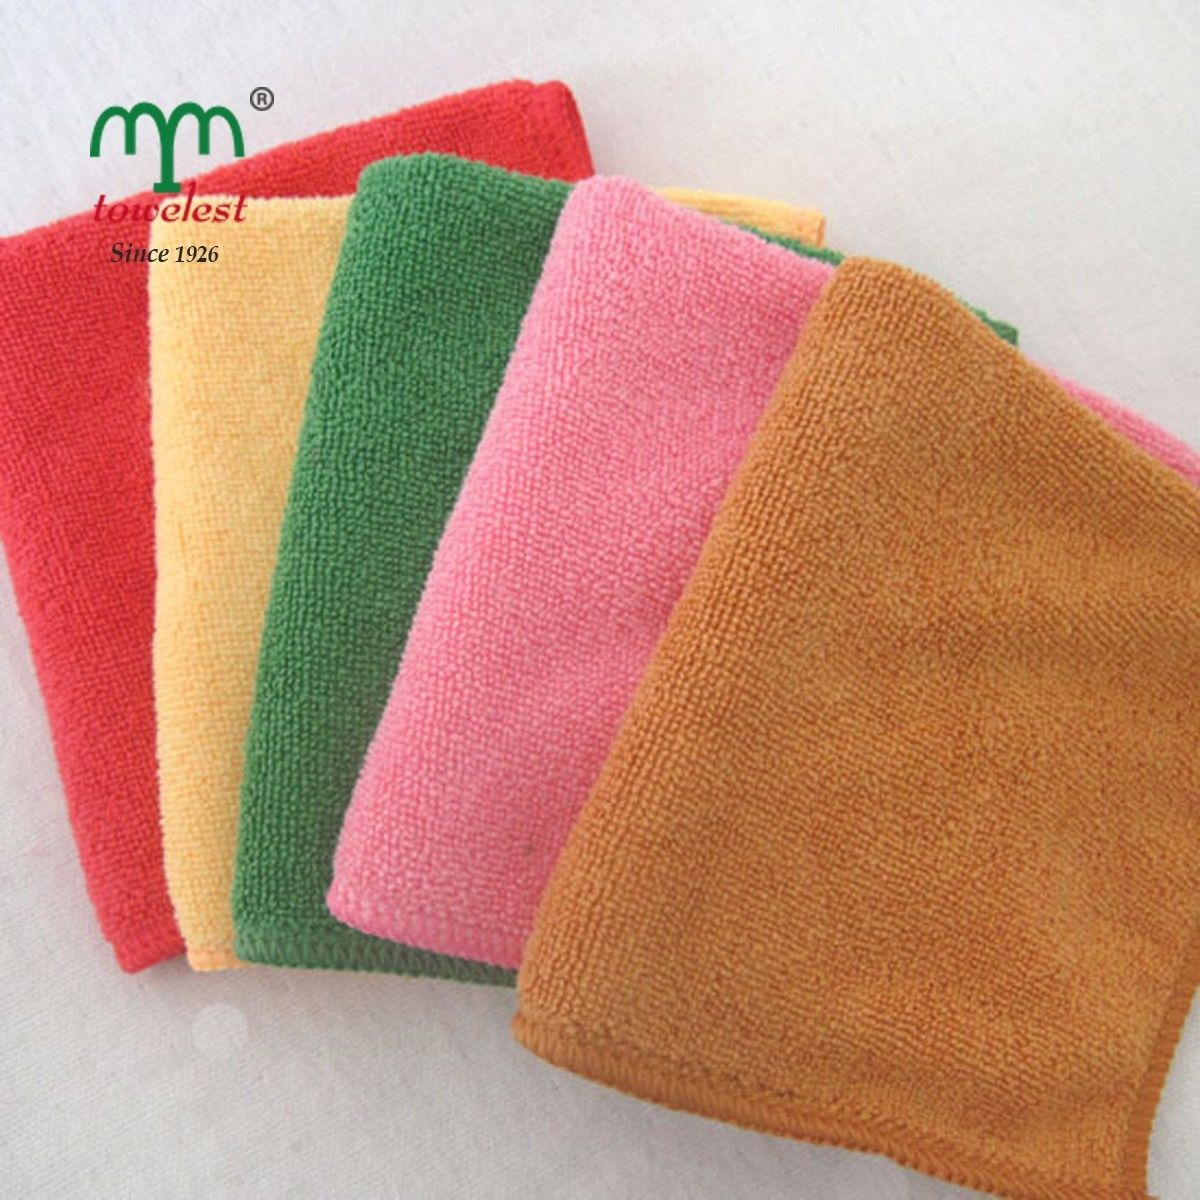 50PC MMY Brand Microfiber Washing Cloths Kitchen Towel ...